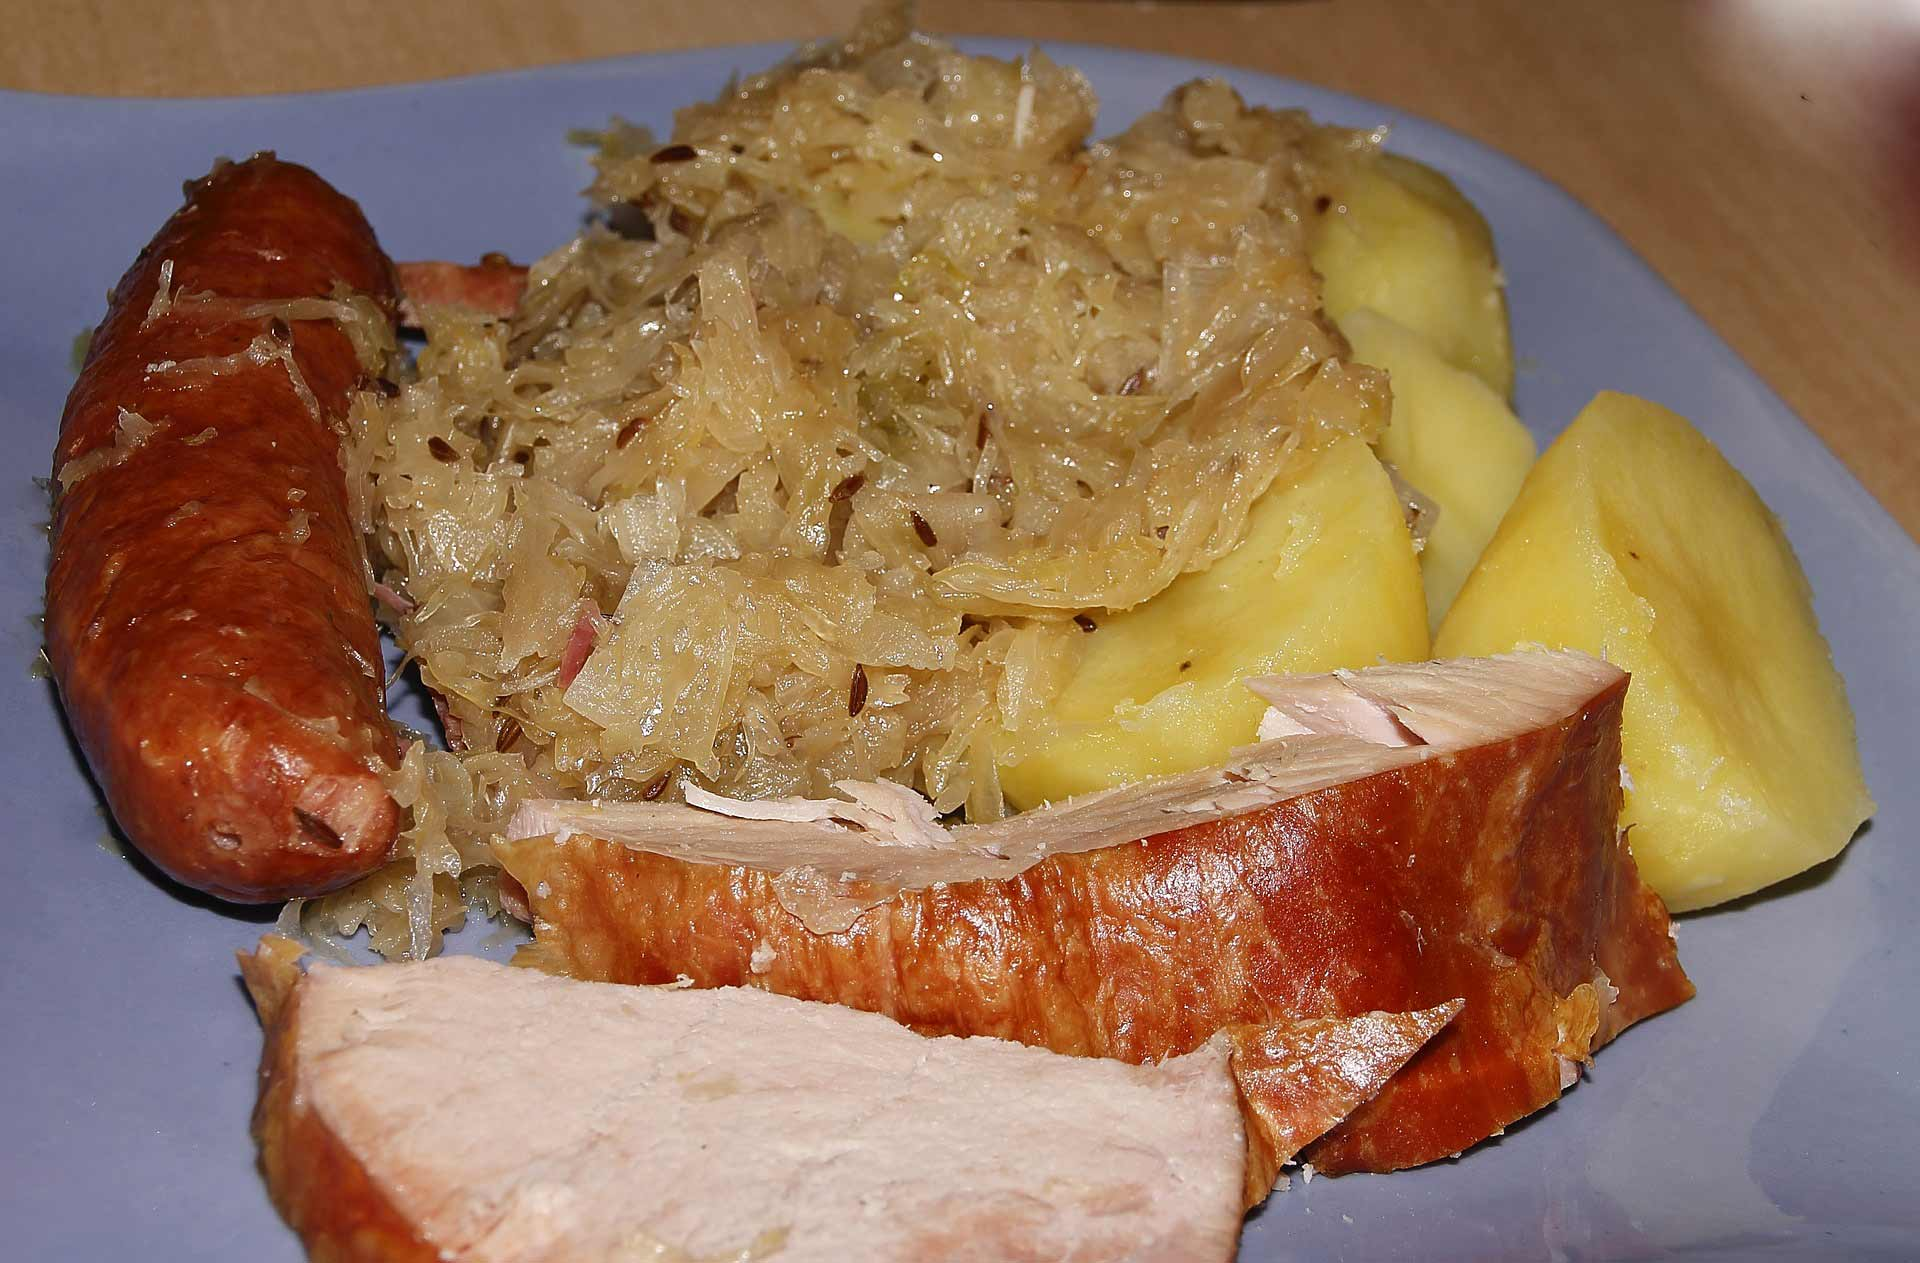 sauerkraut dish - kiseli kupus - podvarak